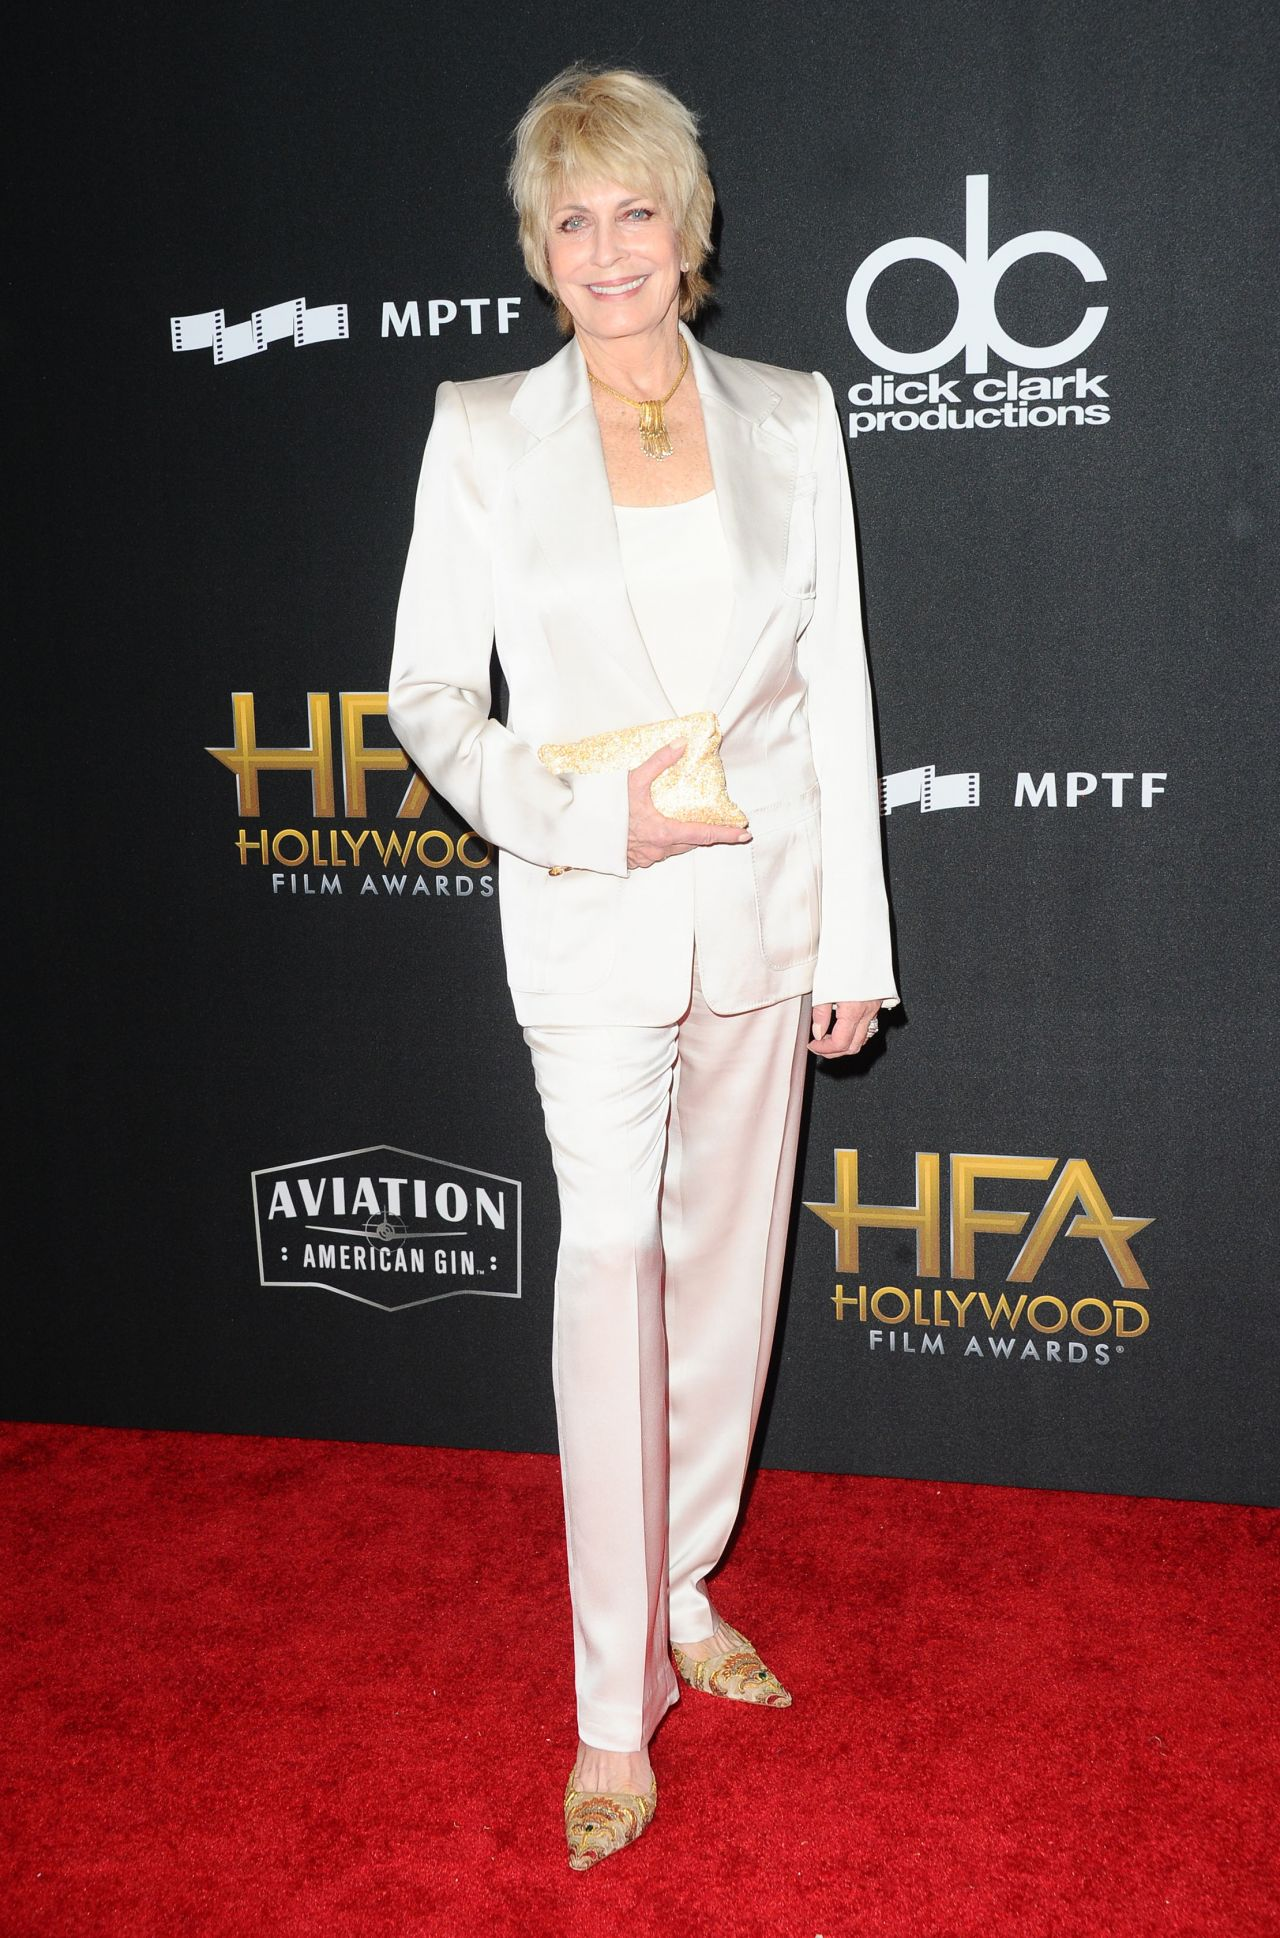 Joanna Cassidy Hollywood Film Awards 2017 In Los Angeles